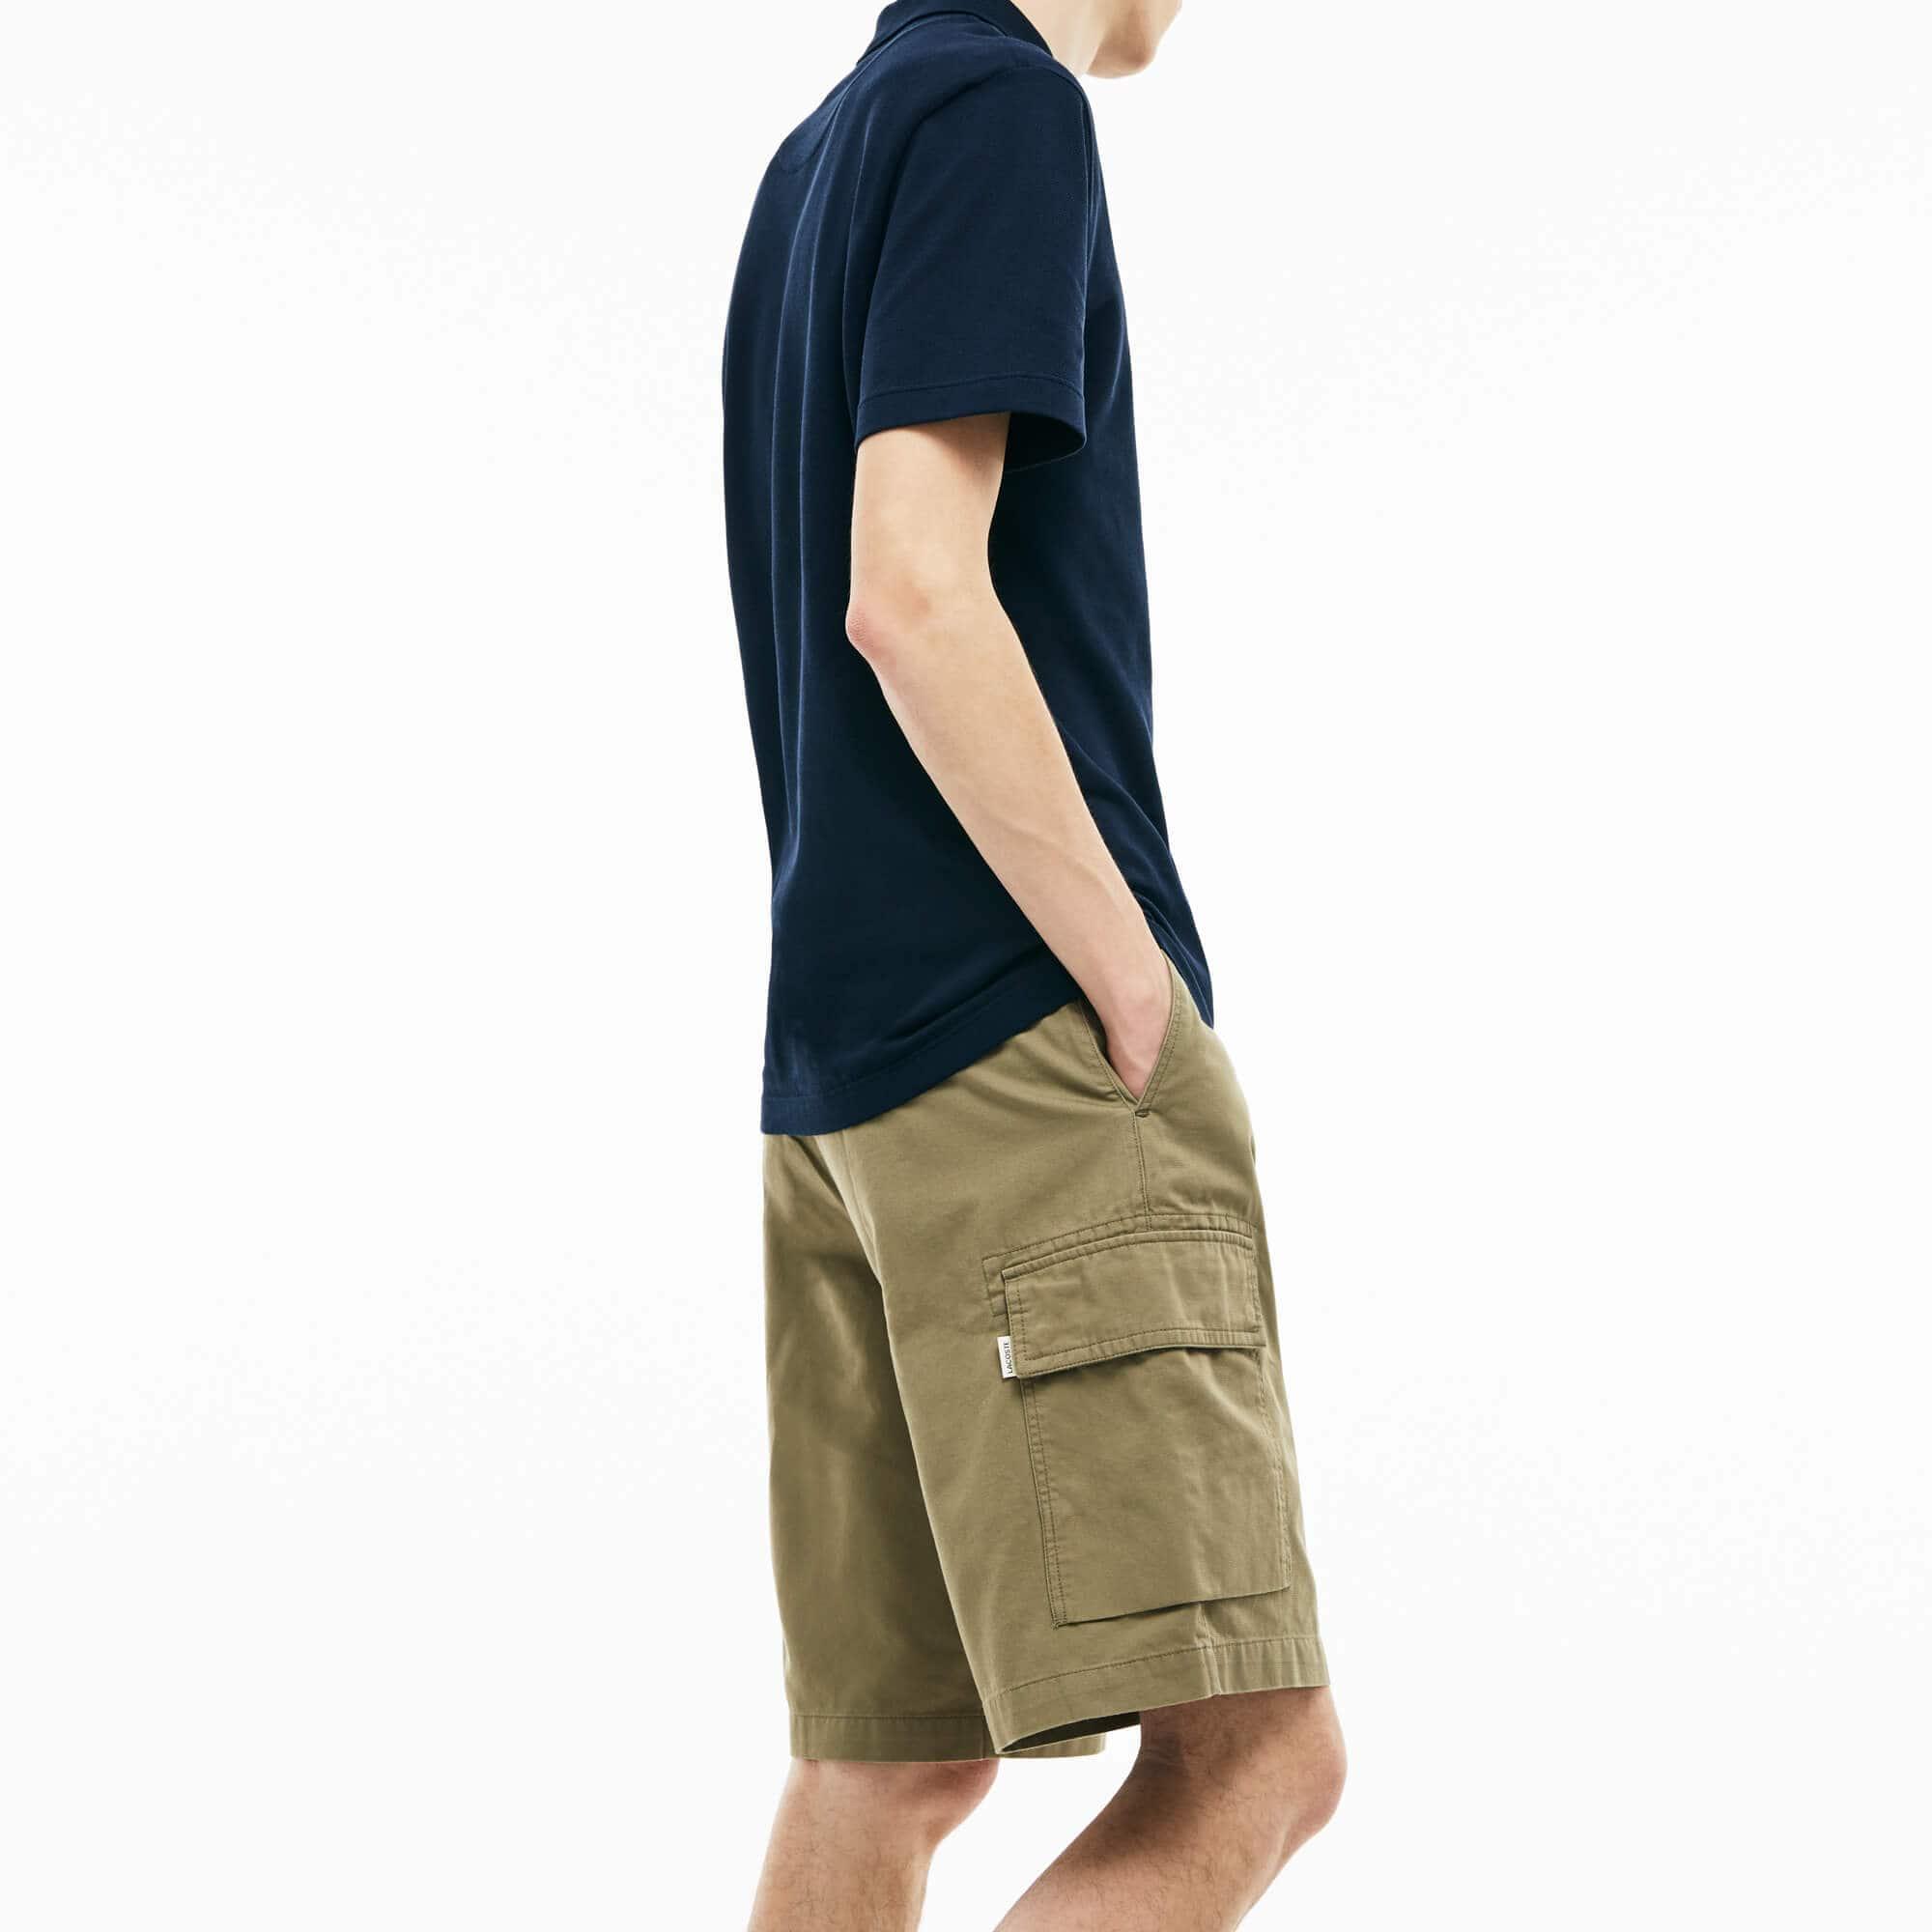 Men's Pockets Cotton Twill Cargo Bermuda Shorts